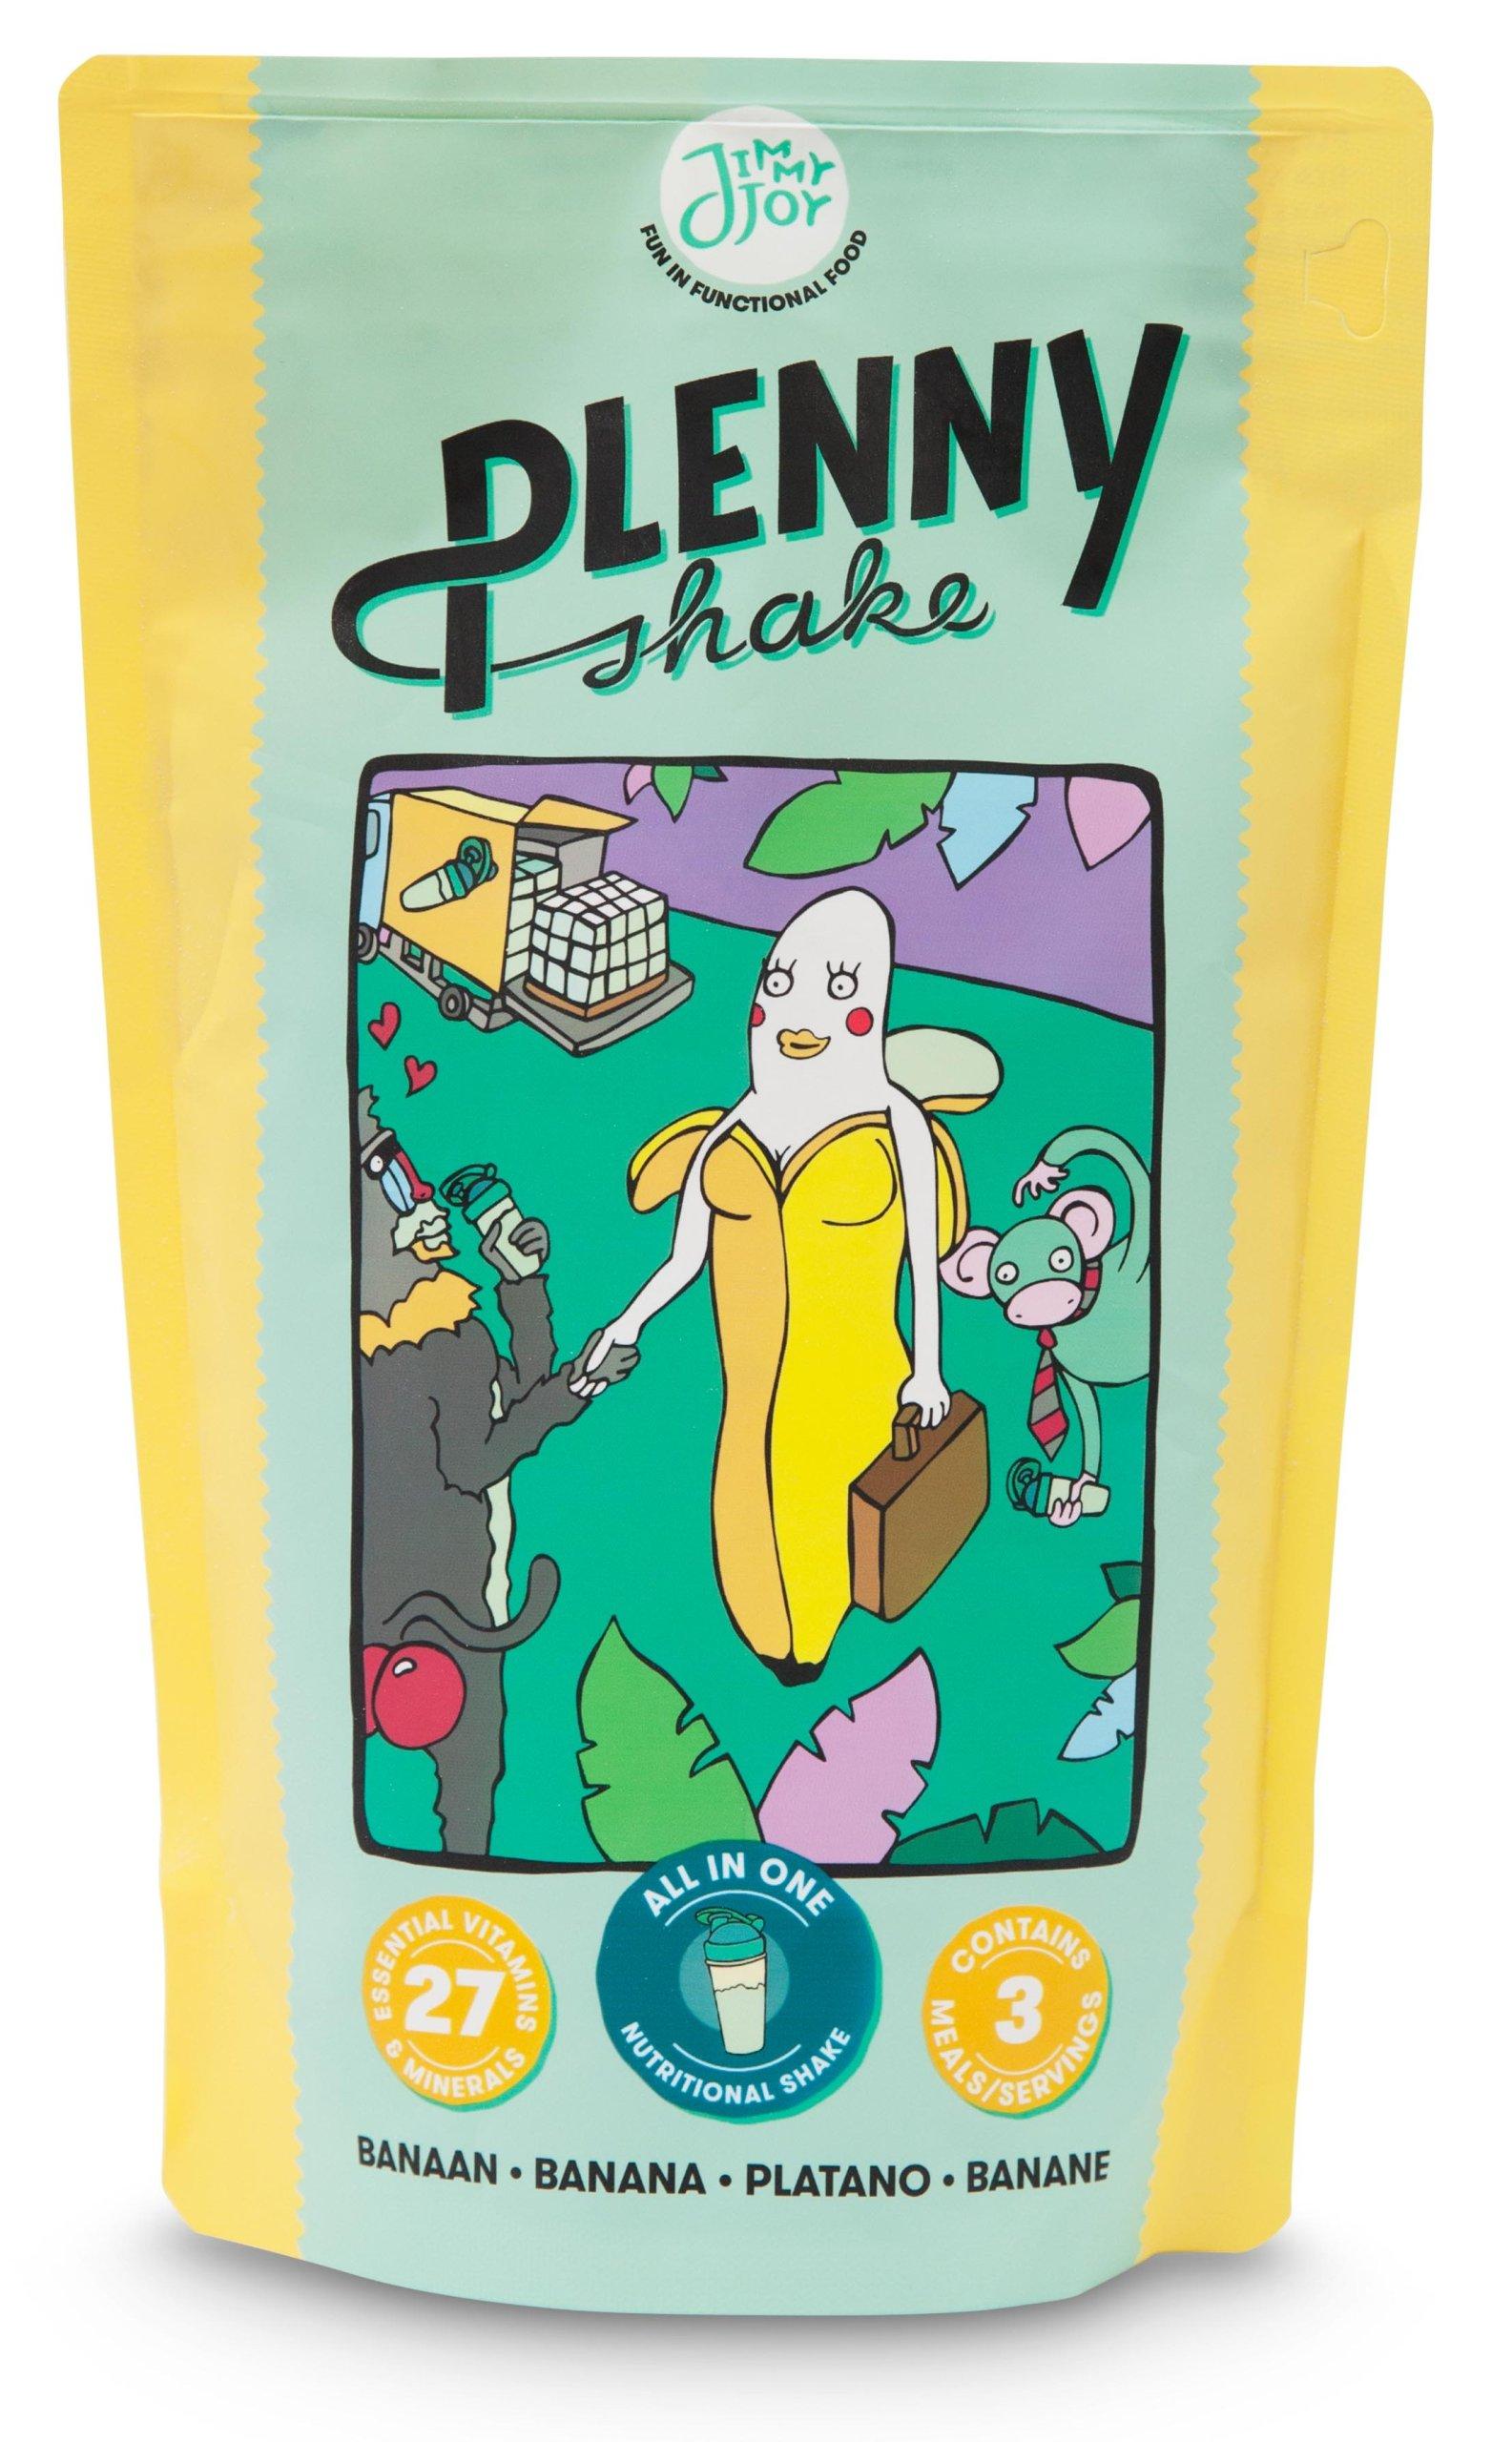 Plenny Shake - banan - szejk.it!